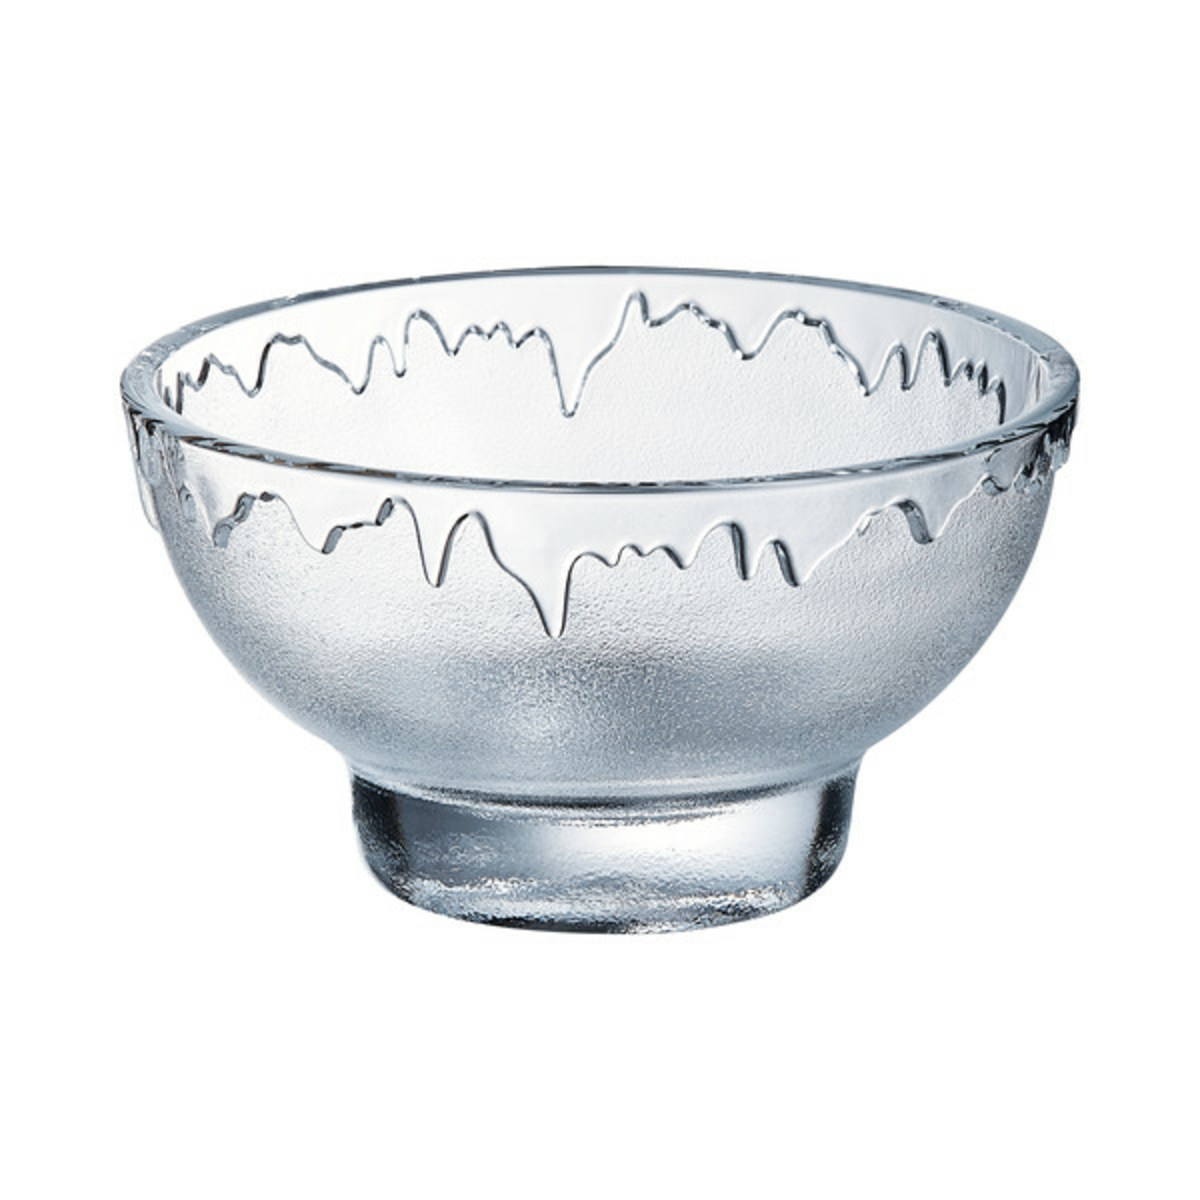 Coupe à dessert ronde transparente verre 20 cl Ø 10,80 cm Pepite Arcoroc